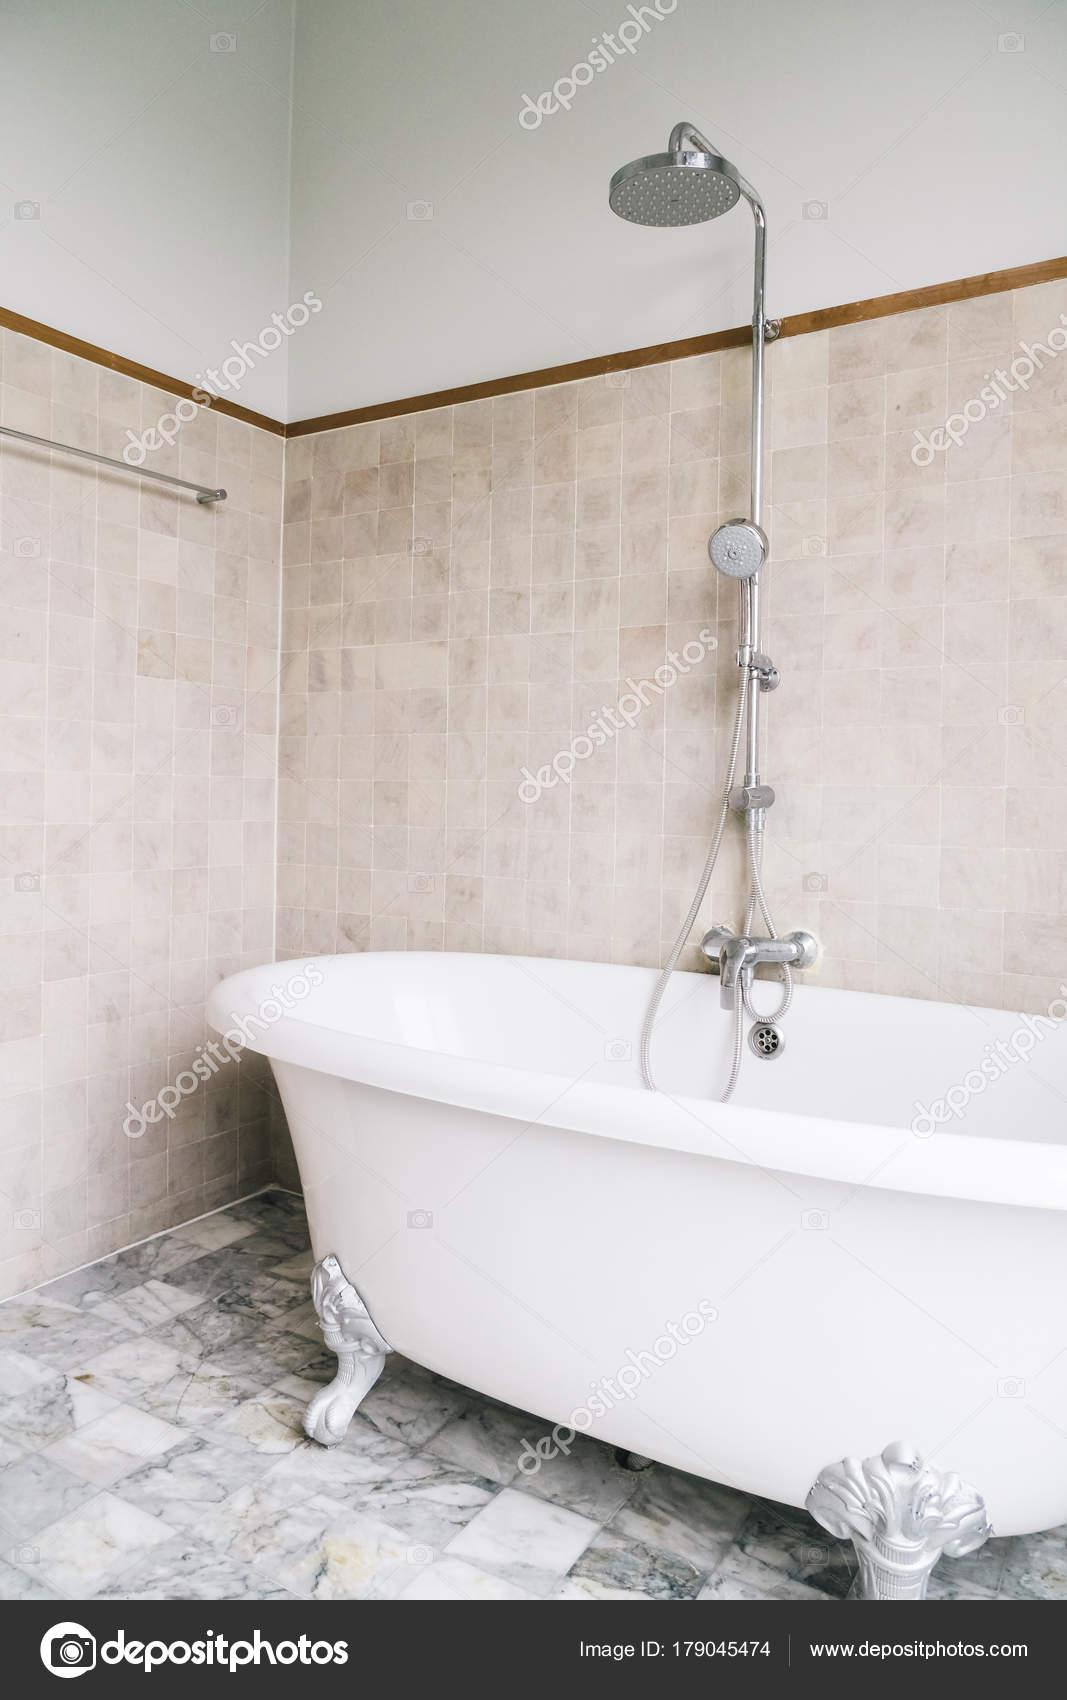 Bad Badkamer Interieur Decoratie — Stockfoto © mrsiraphol #179045474